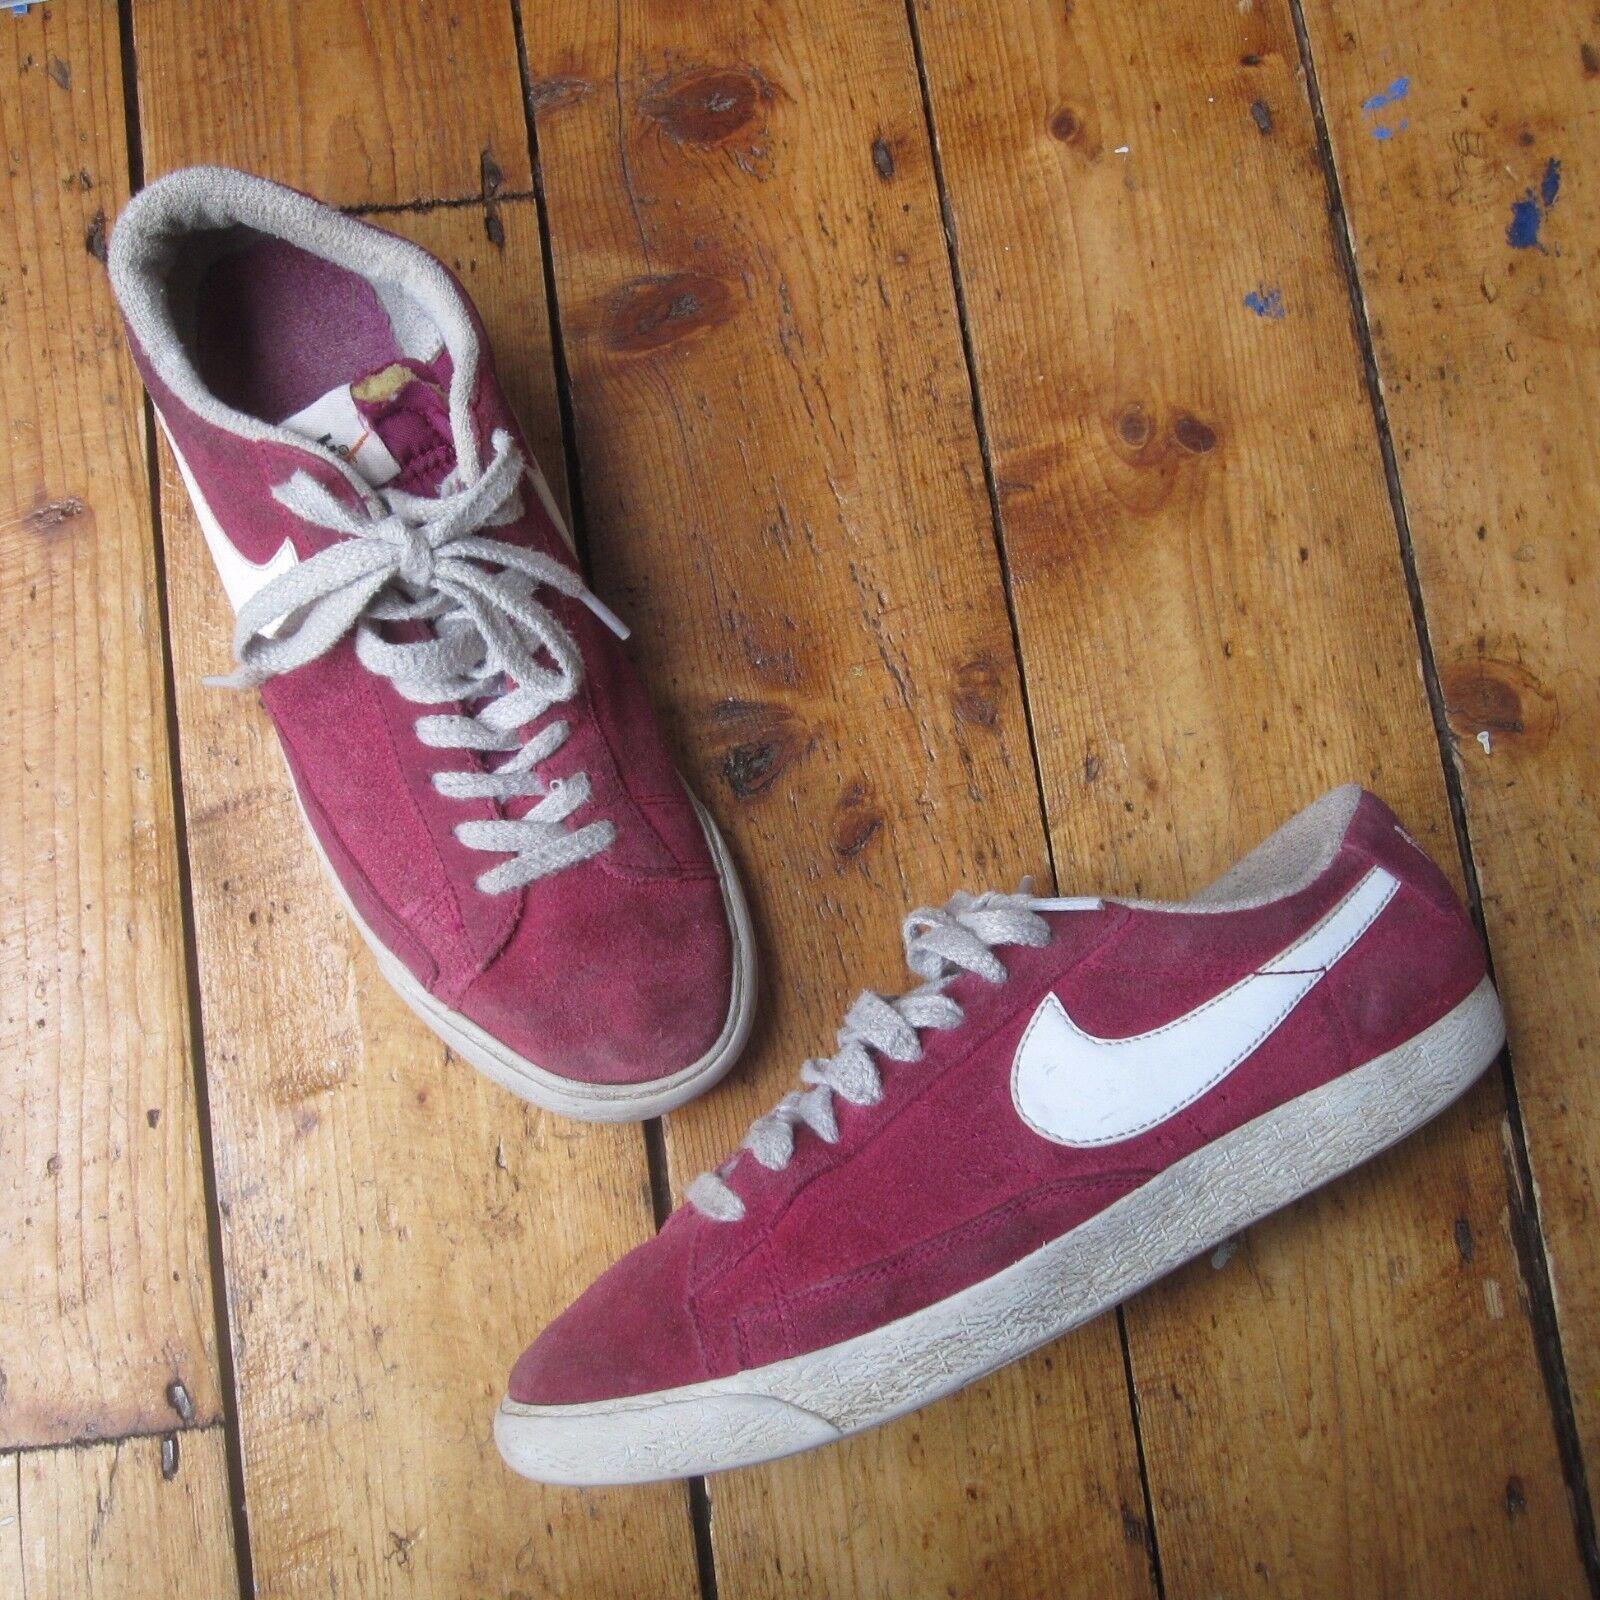 Nike Blazer blazers basse Lo Top Baskets rouge unisexe femme homme uk 6